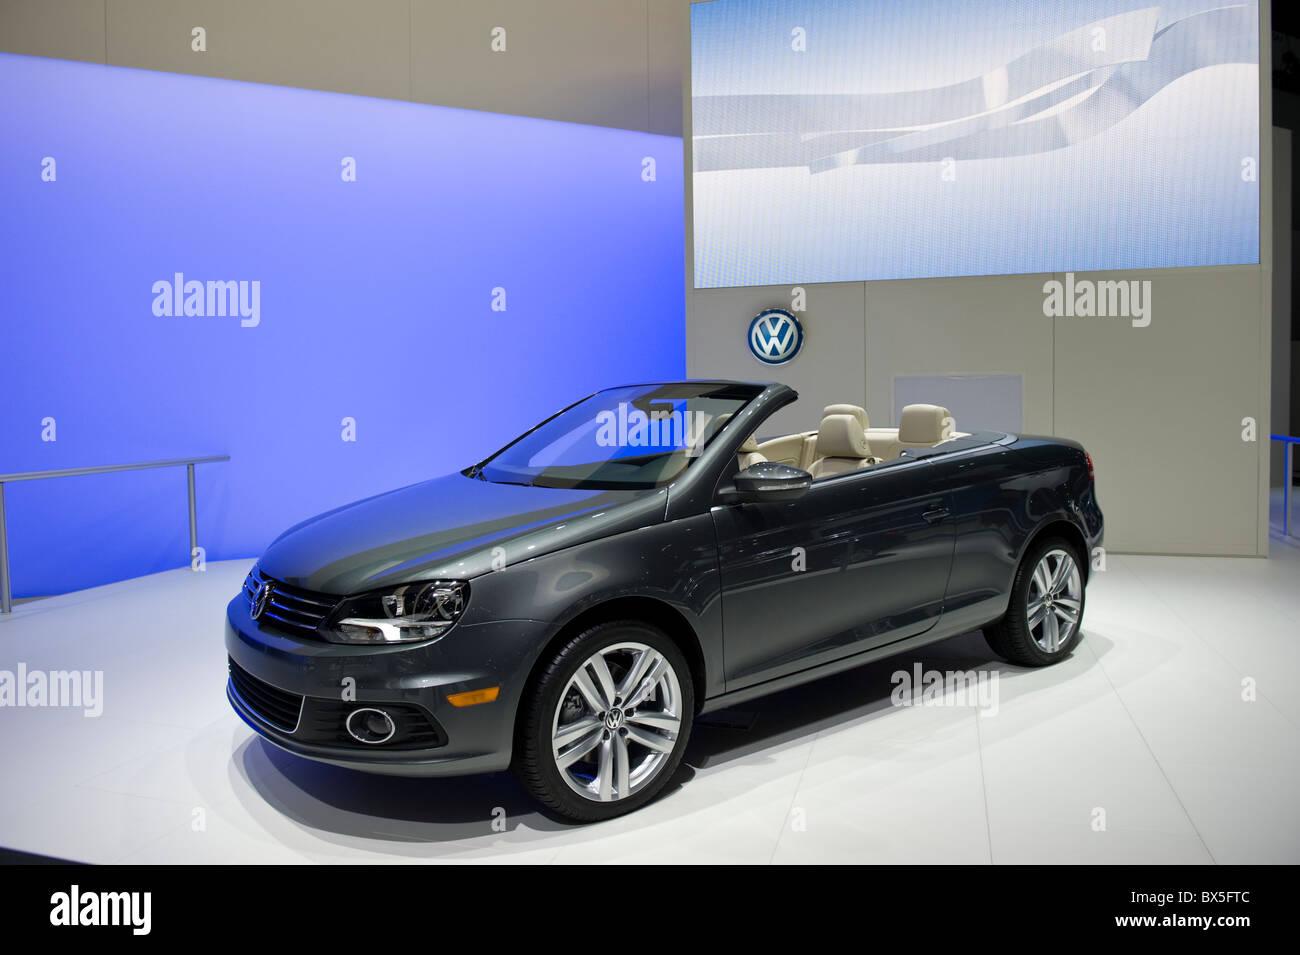 Volkswagen Eos Stock Photos Volkswagen Eos Stock Images Alamy - Eos car show